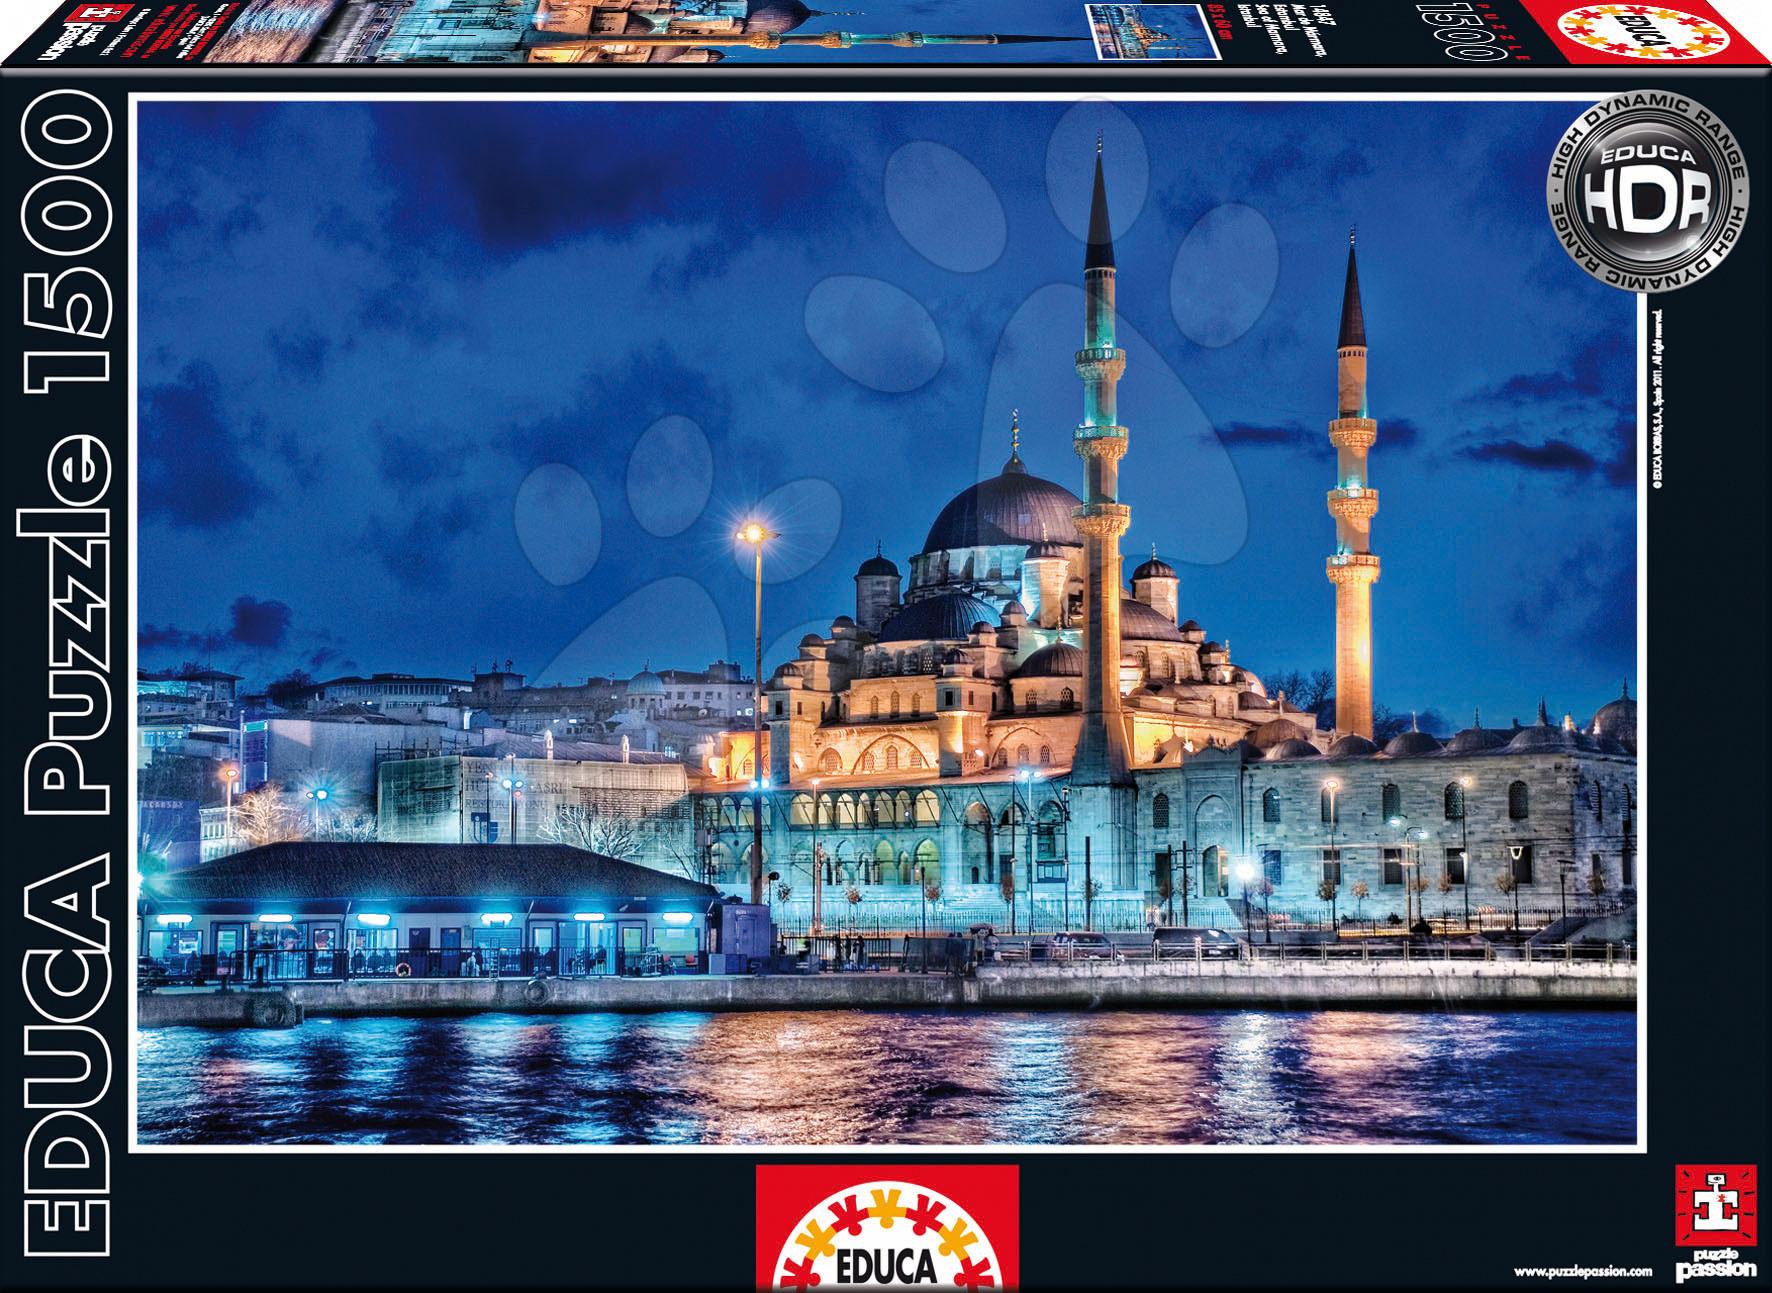 Educa 14847 PUZZLE 1500 delov Sea of Marmara / Istanbul / 85 x 60 cm + FIX PUZZLE LEPILO